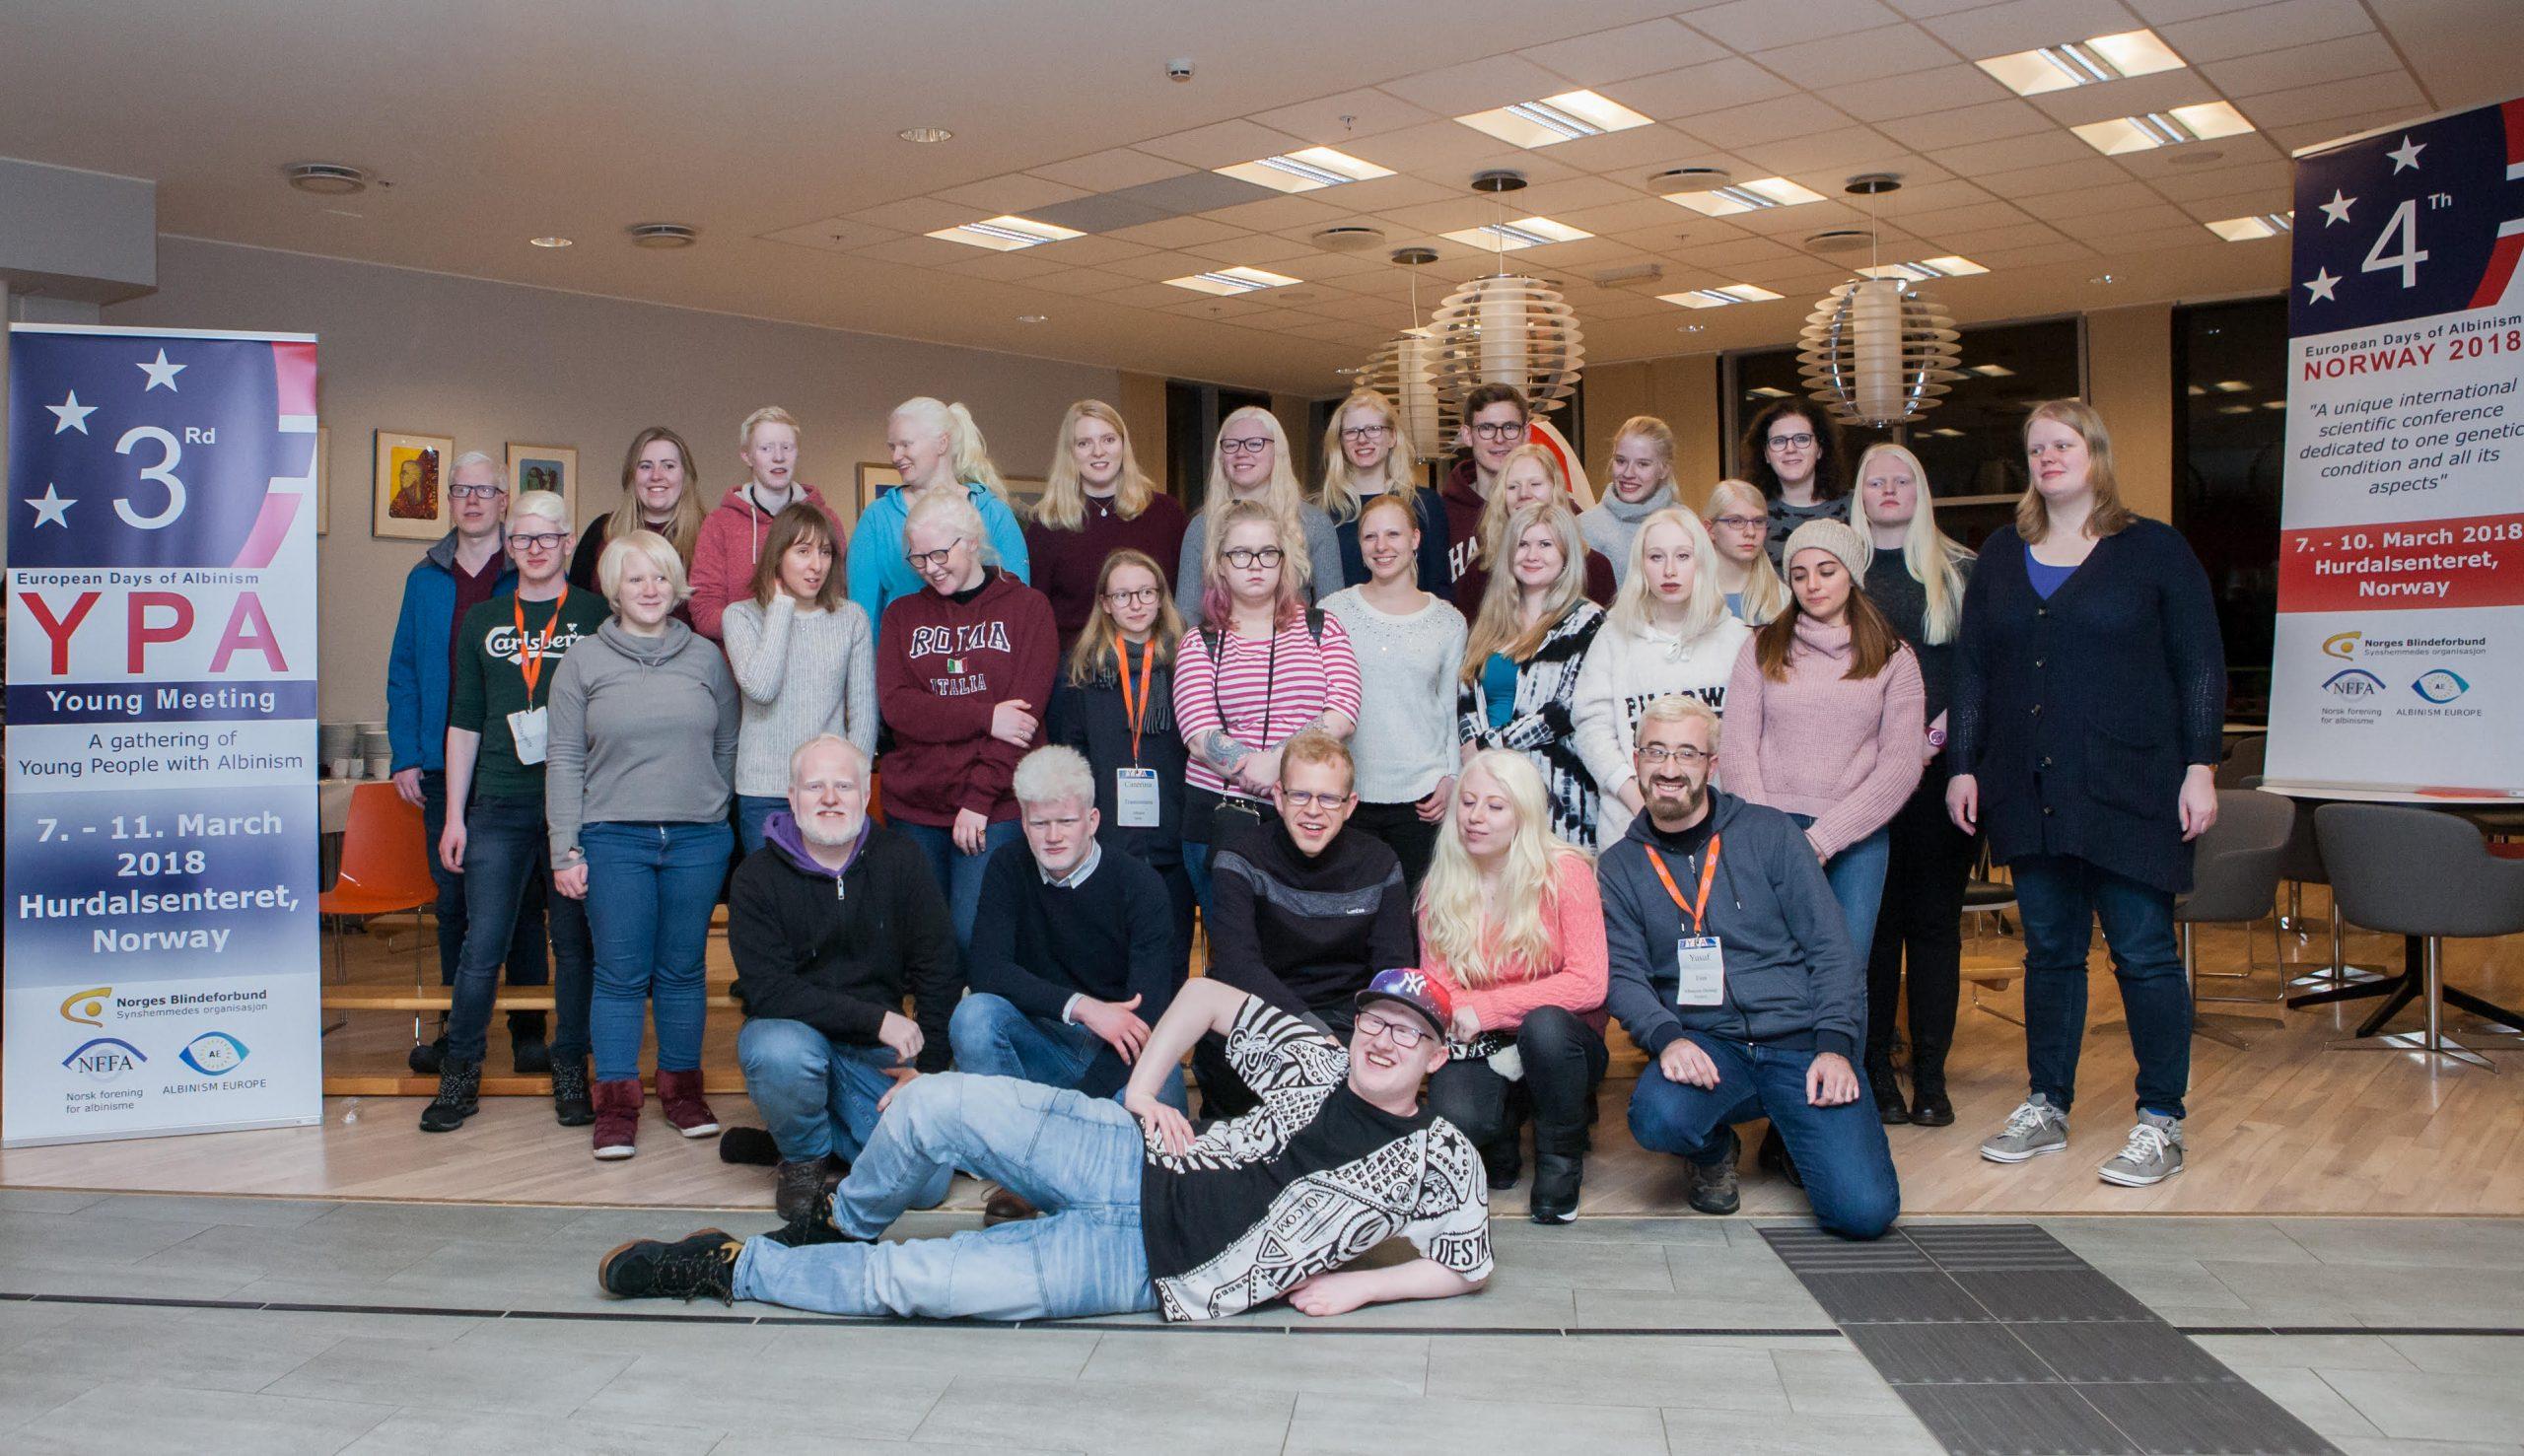 Foto de grupo participantes en la 3YPA